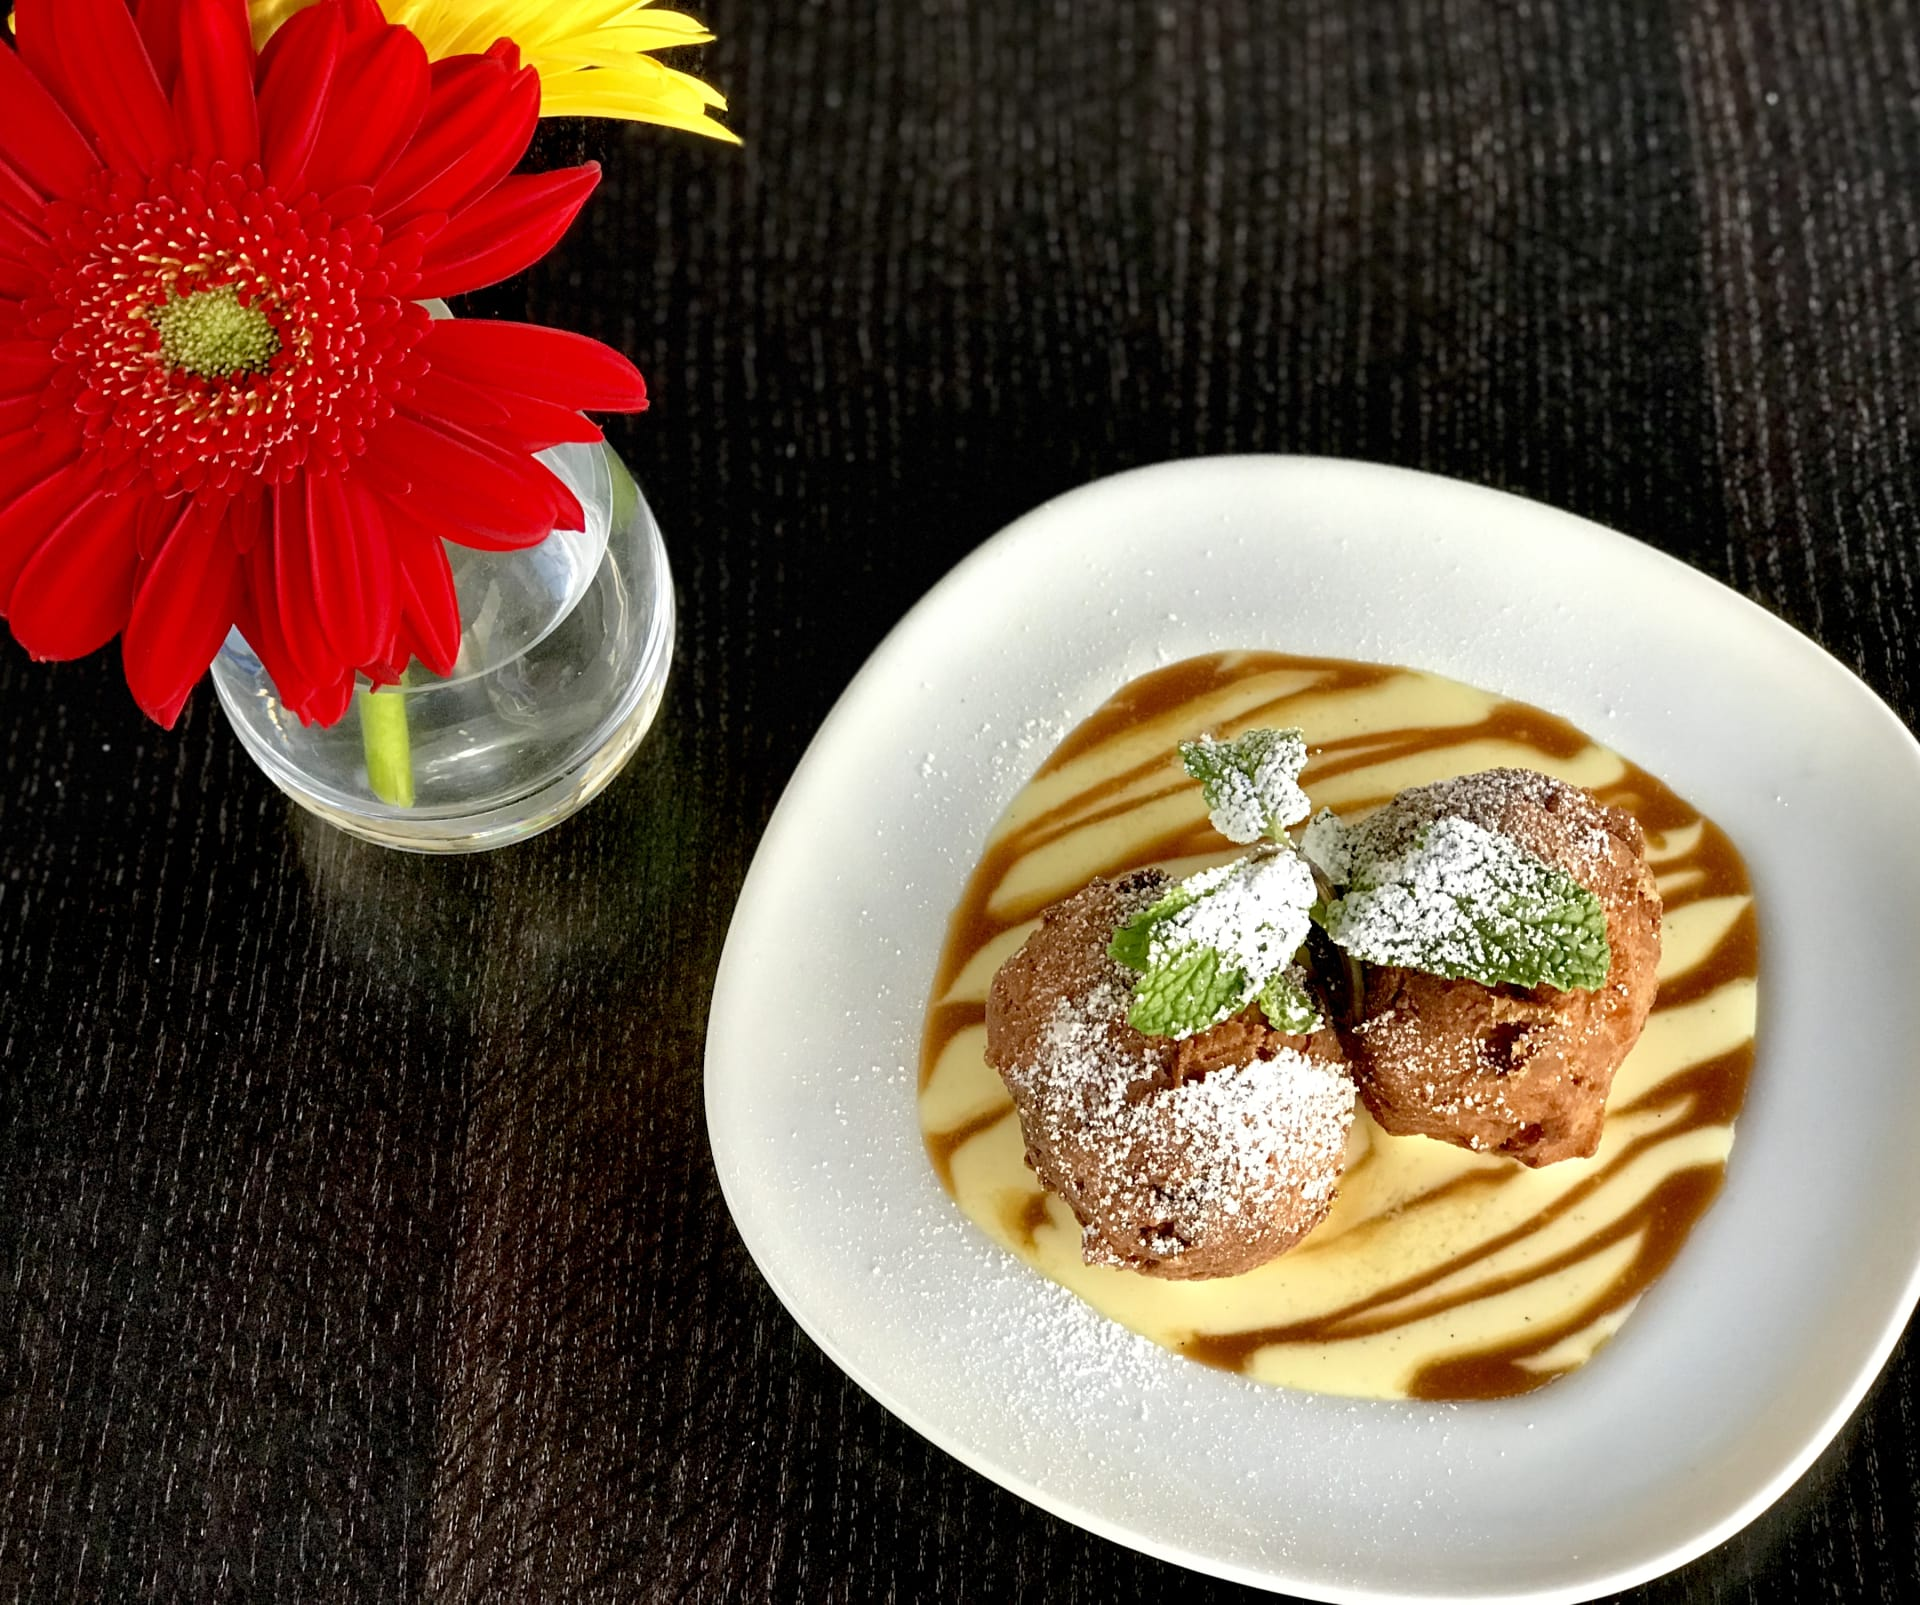 Cinnamon AppleBeignets w/ CrèmeAnglaise & Homemade Caramel